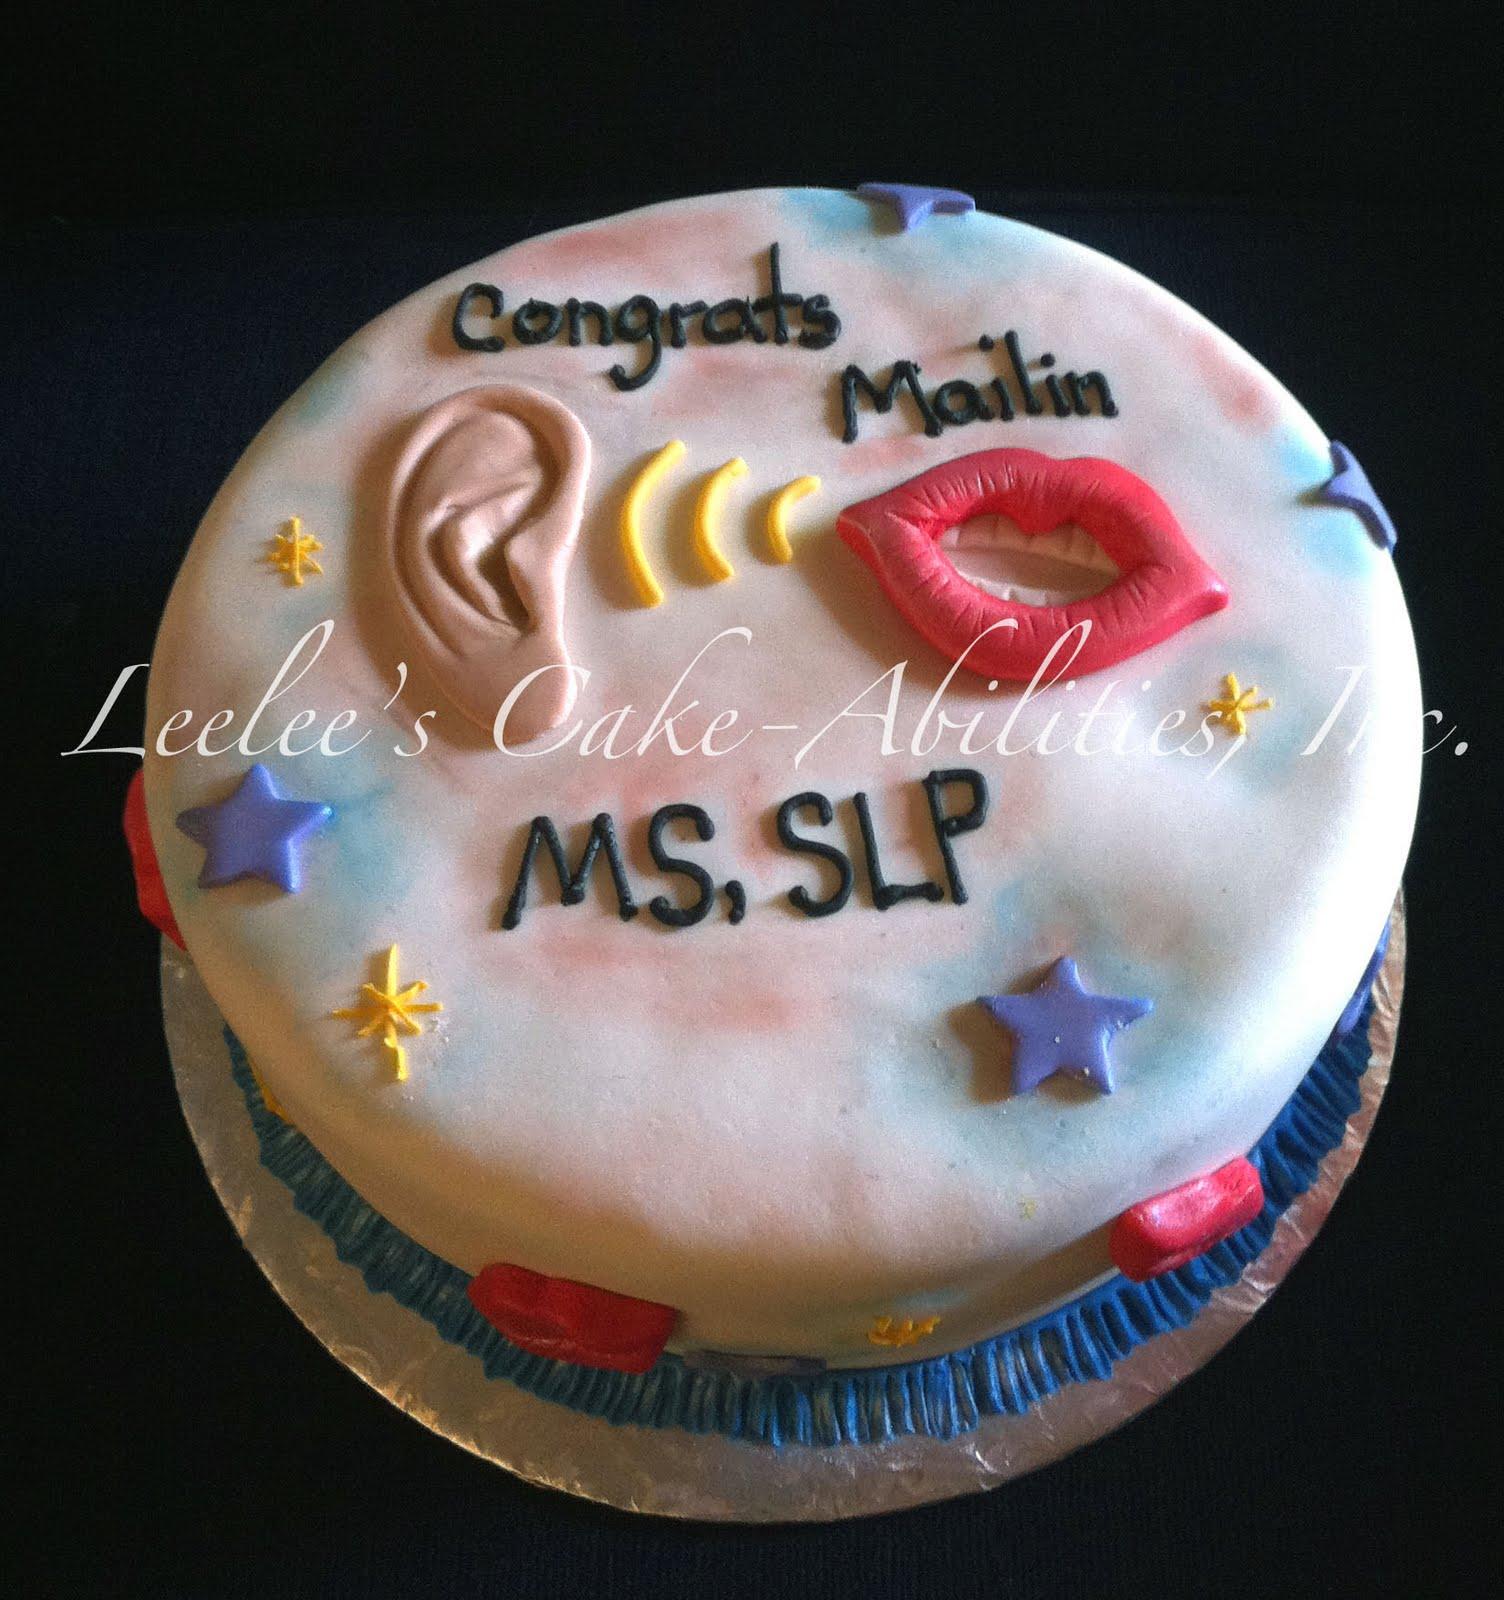 Leelees Cakeabilities Speech Language Pathology Cake